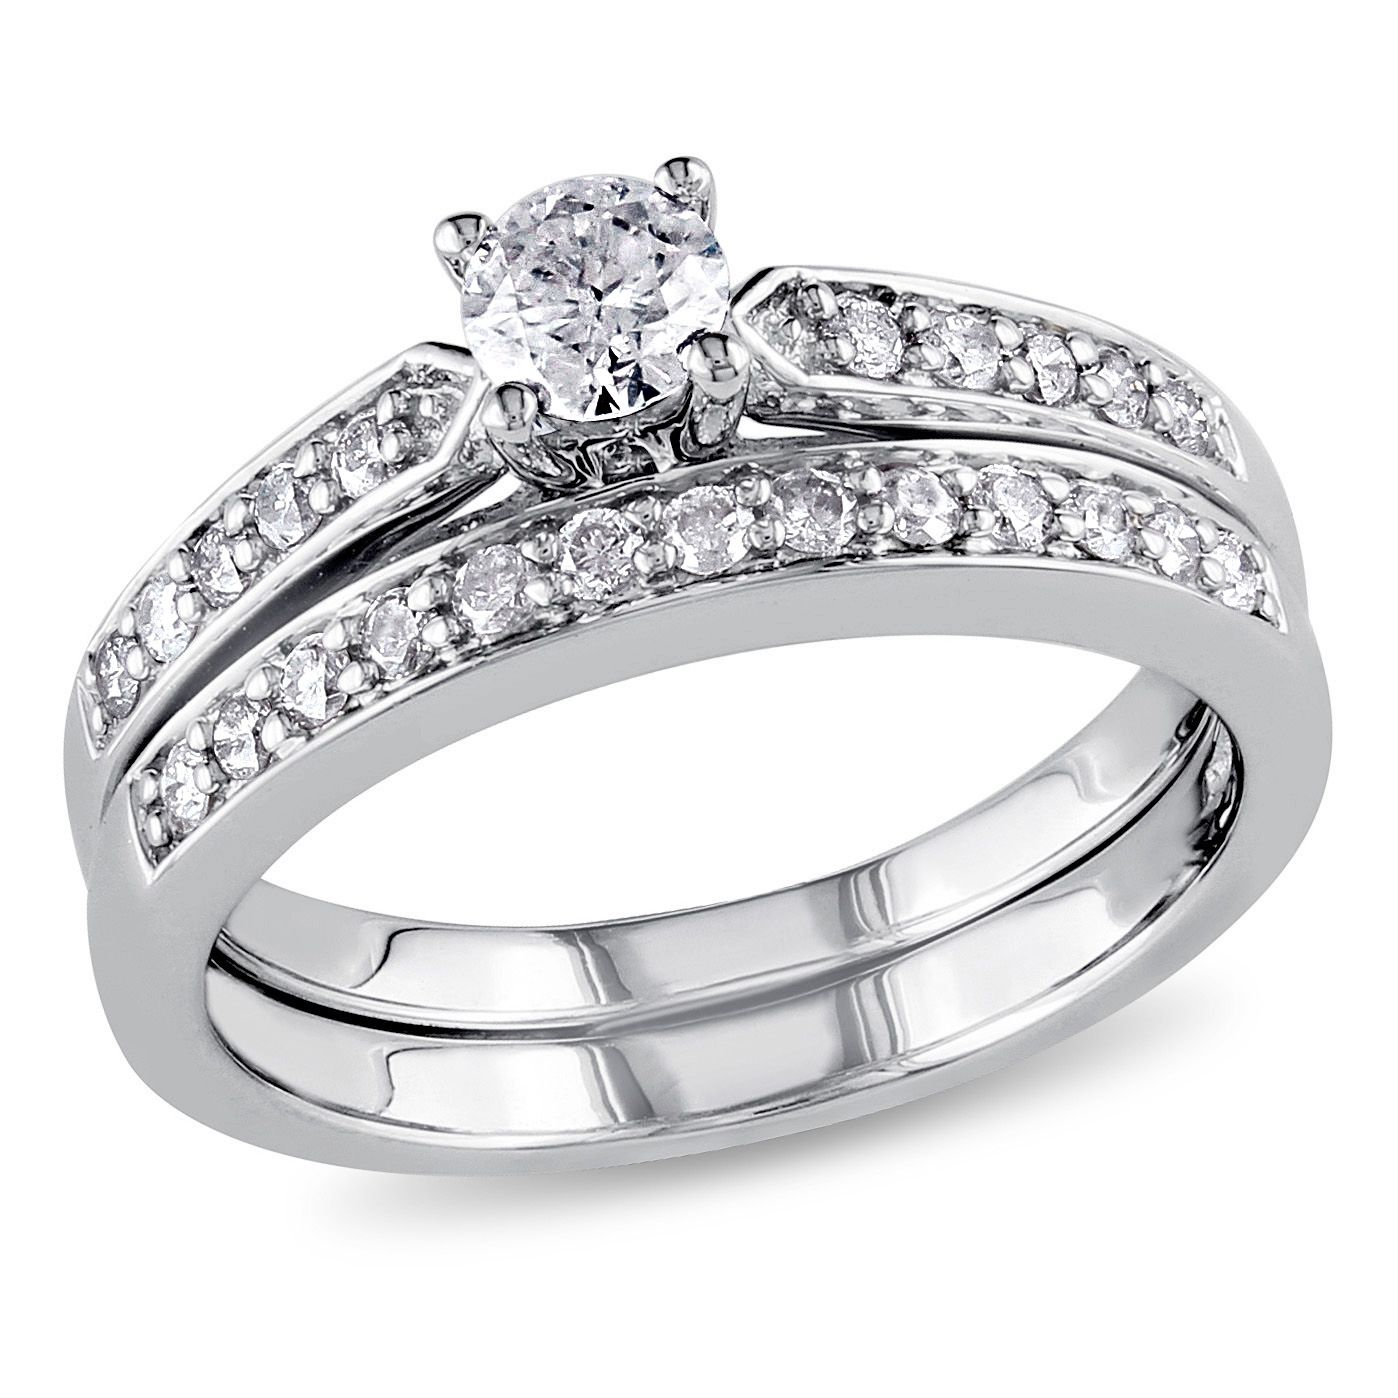 Miabella 1 2 Carat T W Diamond Sterling Silver Bridal Set Walmart Com In 2020 Diamond Bridal Ring Sets Diamond Bridal Sets Three Stone Diamond Rings Engagement